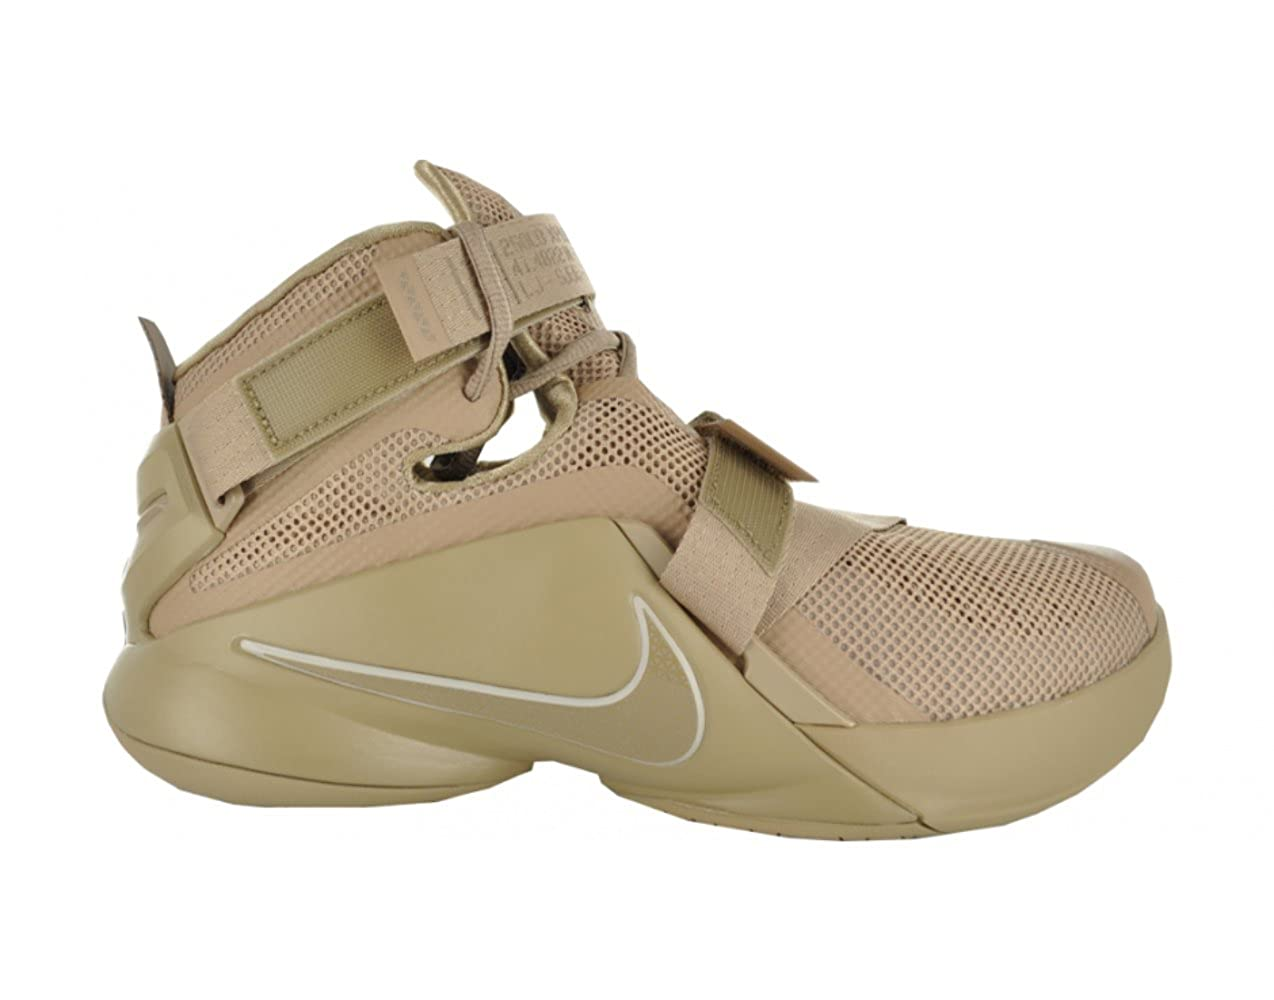 Nike Lebron Soldier IX PRM Limited Edition 749490-222 Desert camo Military  Size 9. 5  Amazon.in  Shoes   Handbags 48fa14cfe79e